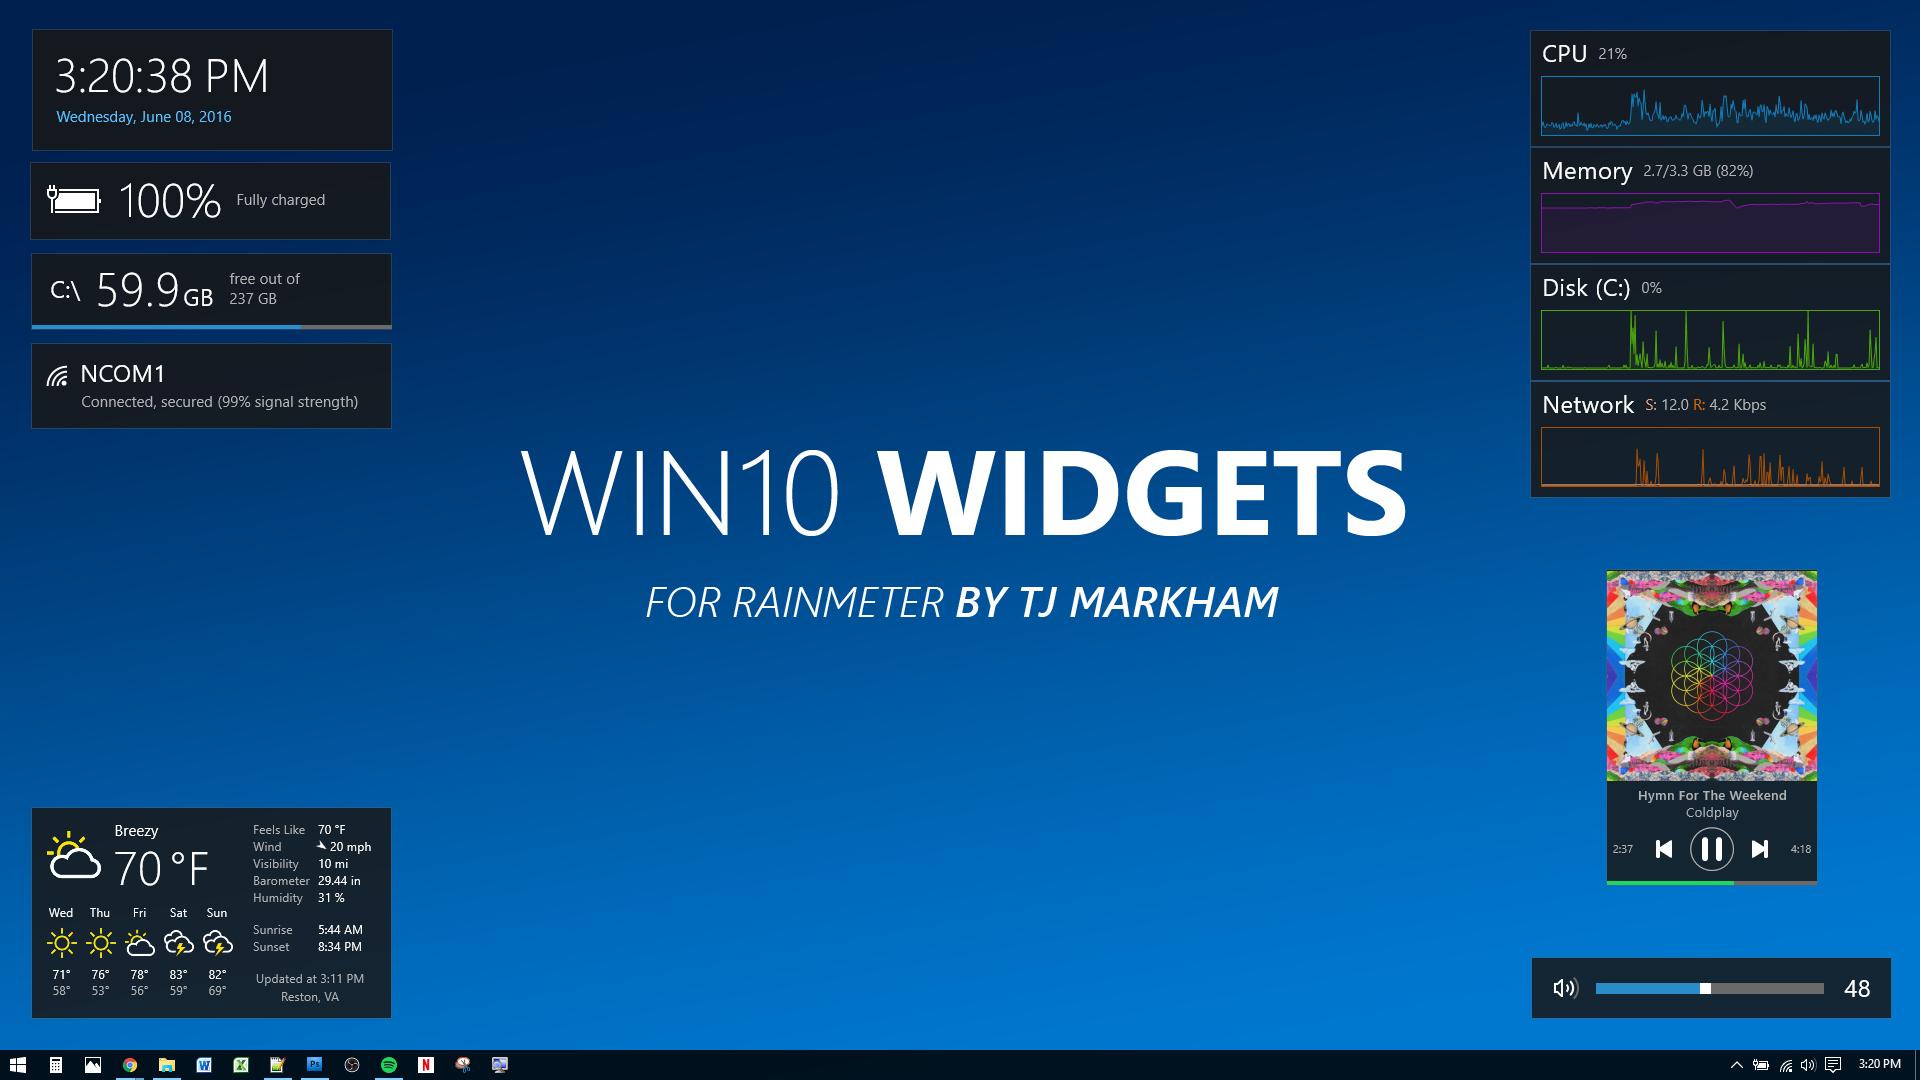 Win10 Widgets  Widgets For Windows 10 regarding Calendar Gadget For Windows 10